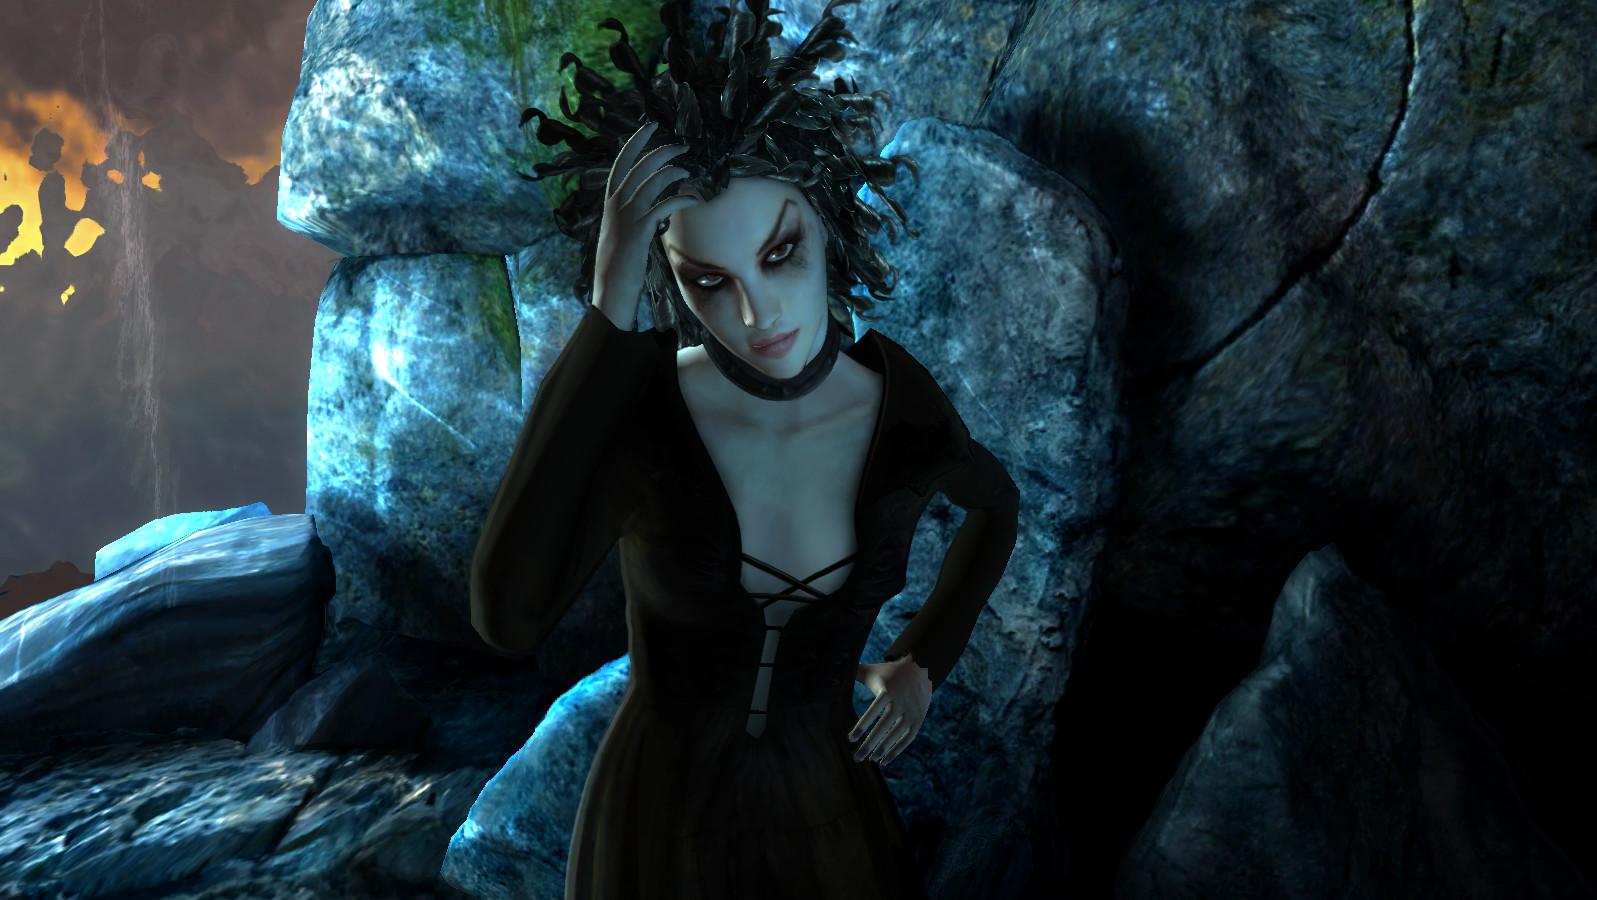 Nicolas Eymerich The Inquisitor Book II : The Village screenshot